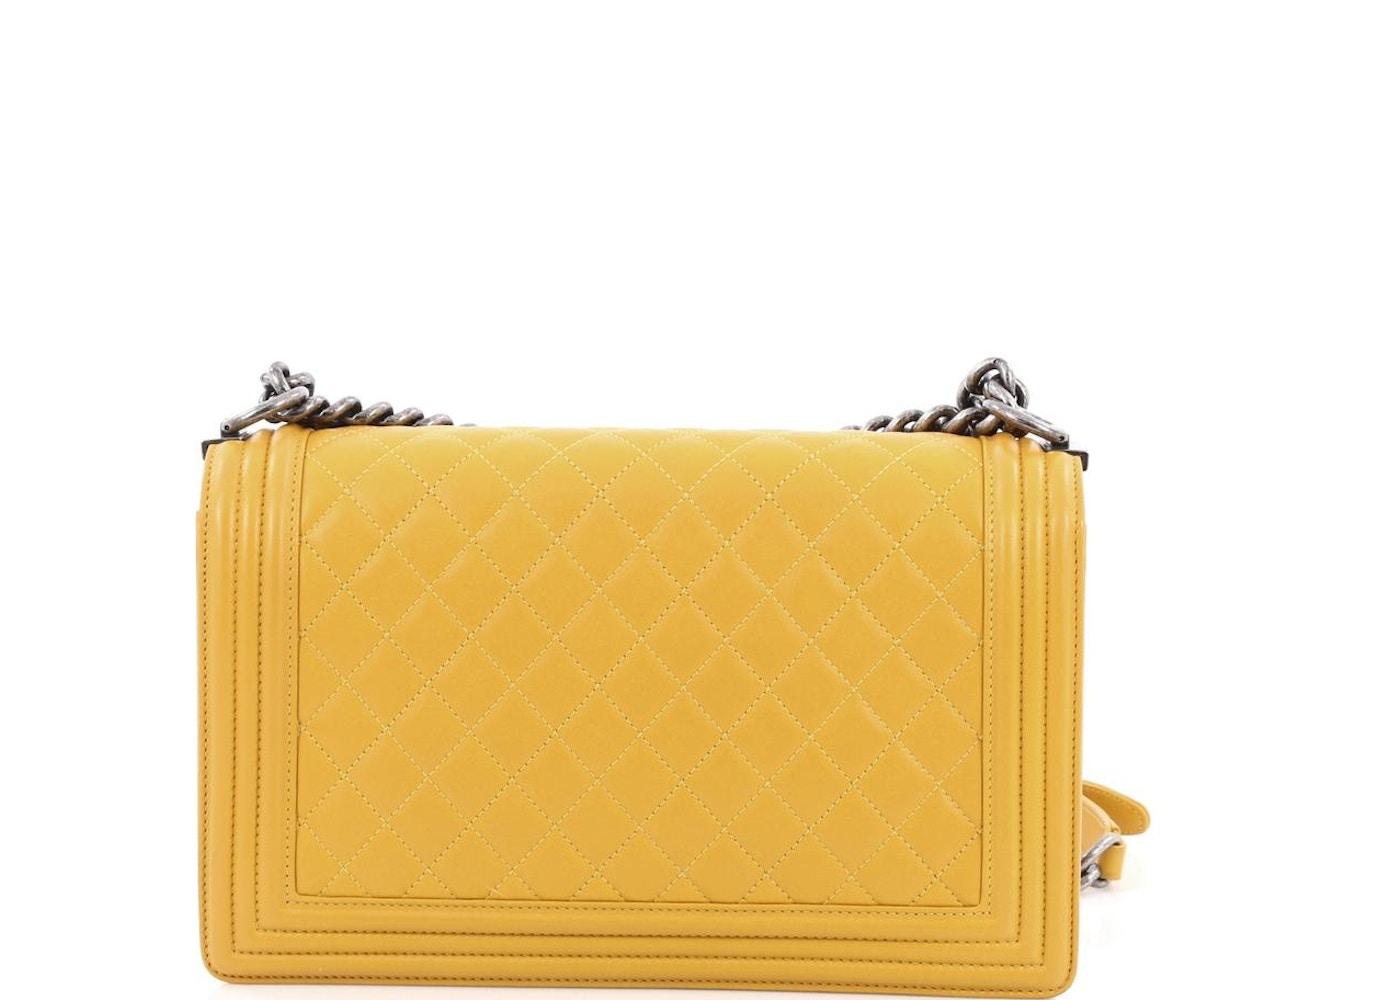 abd2b830f9dadc Chanel Boy Flap Bag Quilted Diamond New Medium Mustard Yellow